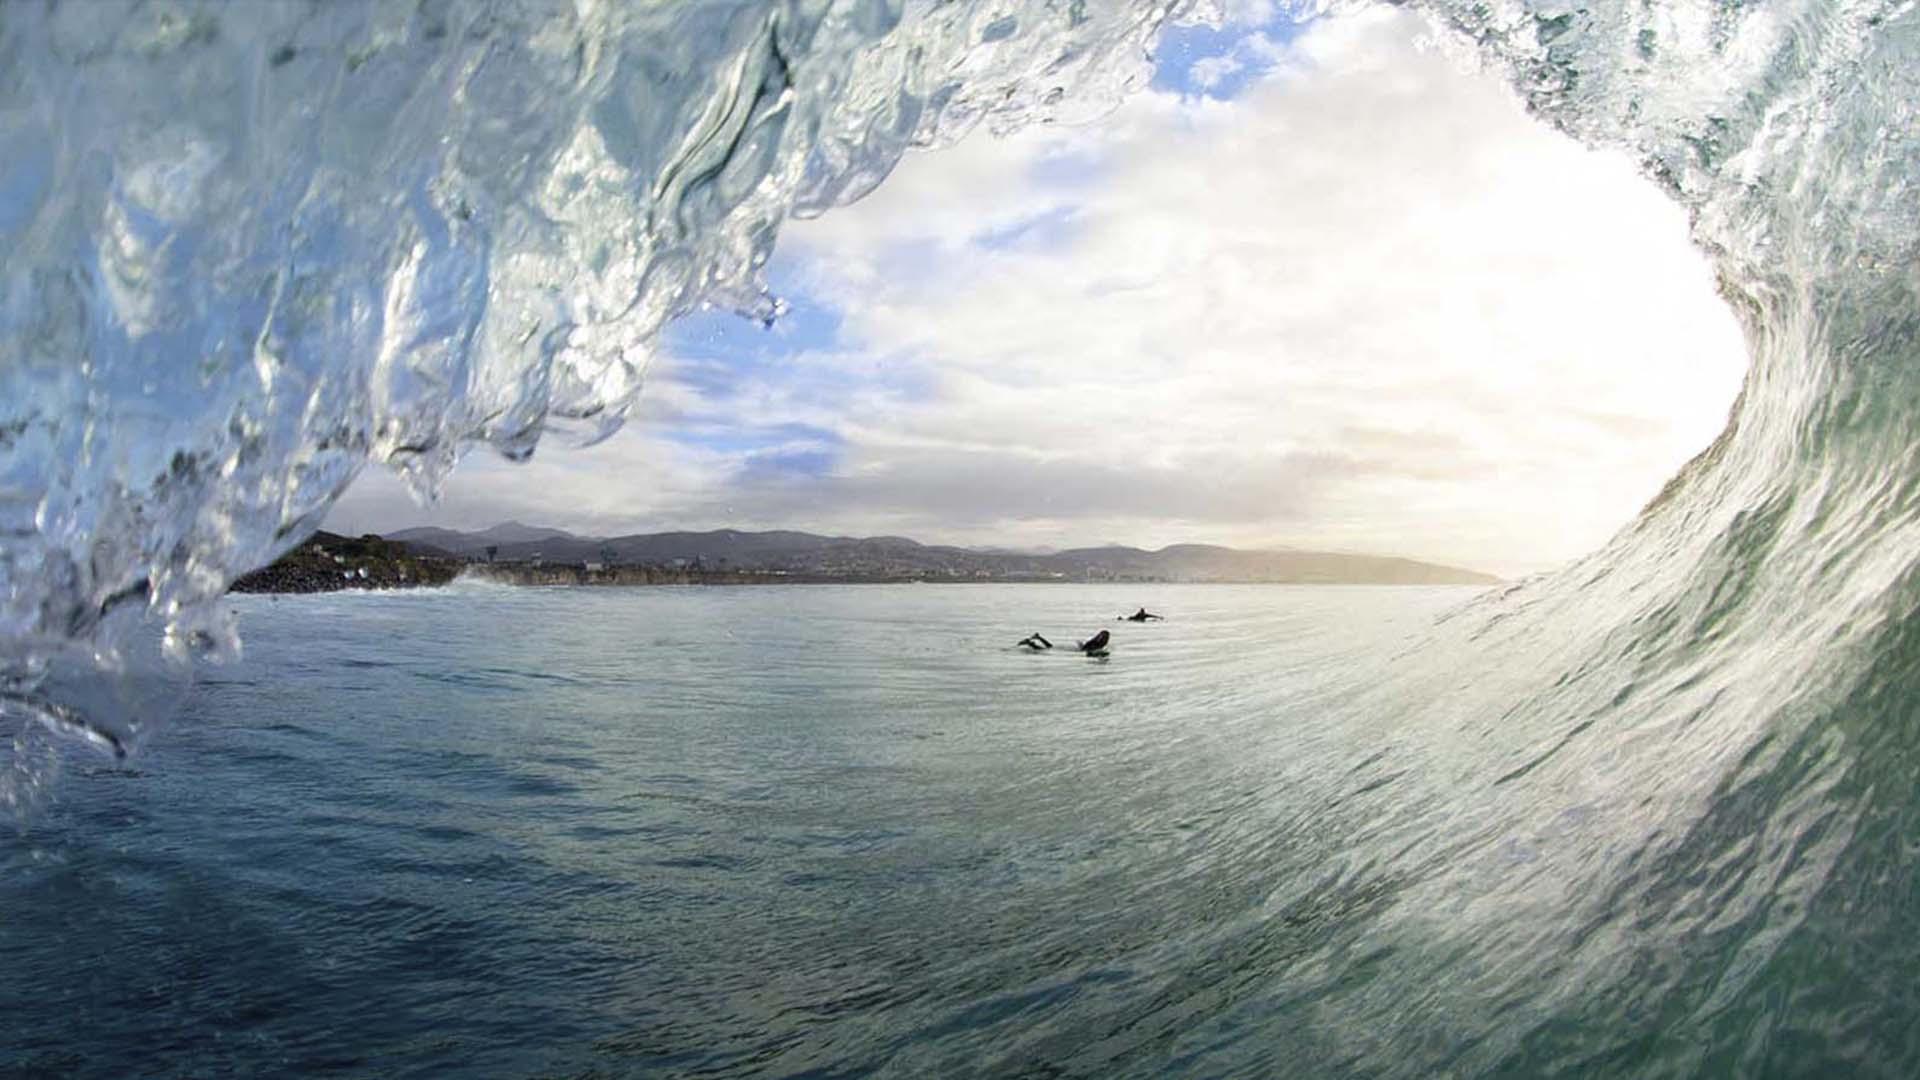 Ensenada Surfing Cradle of México